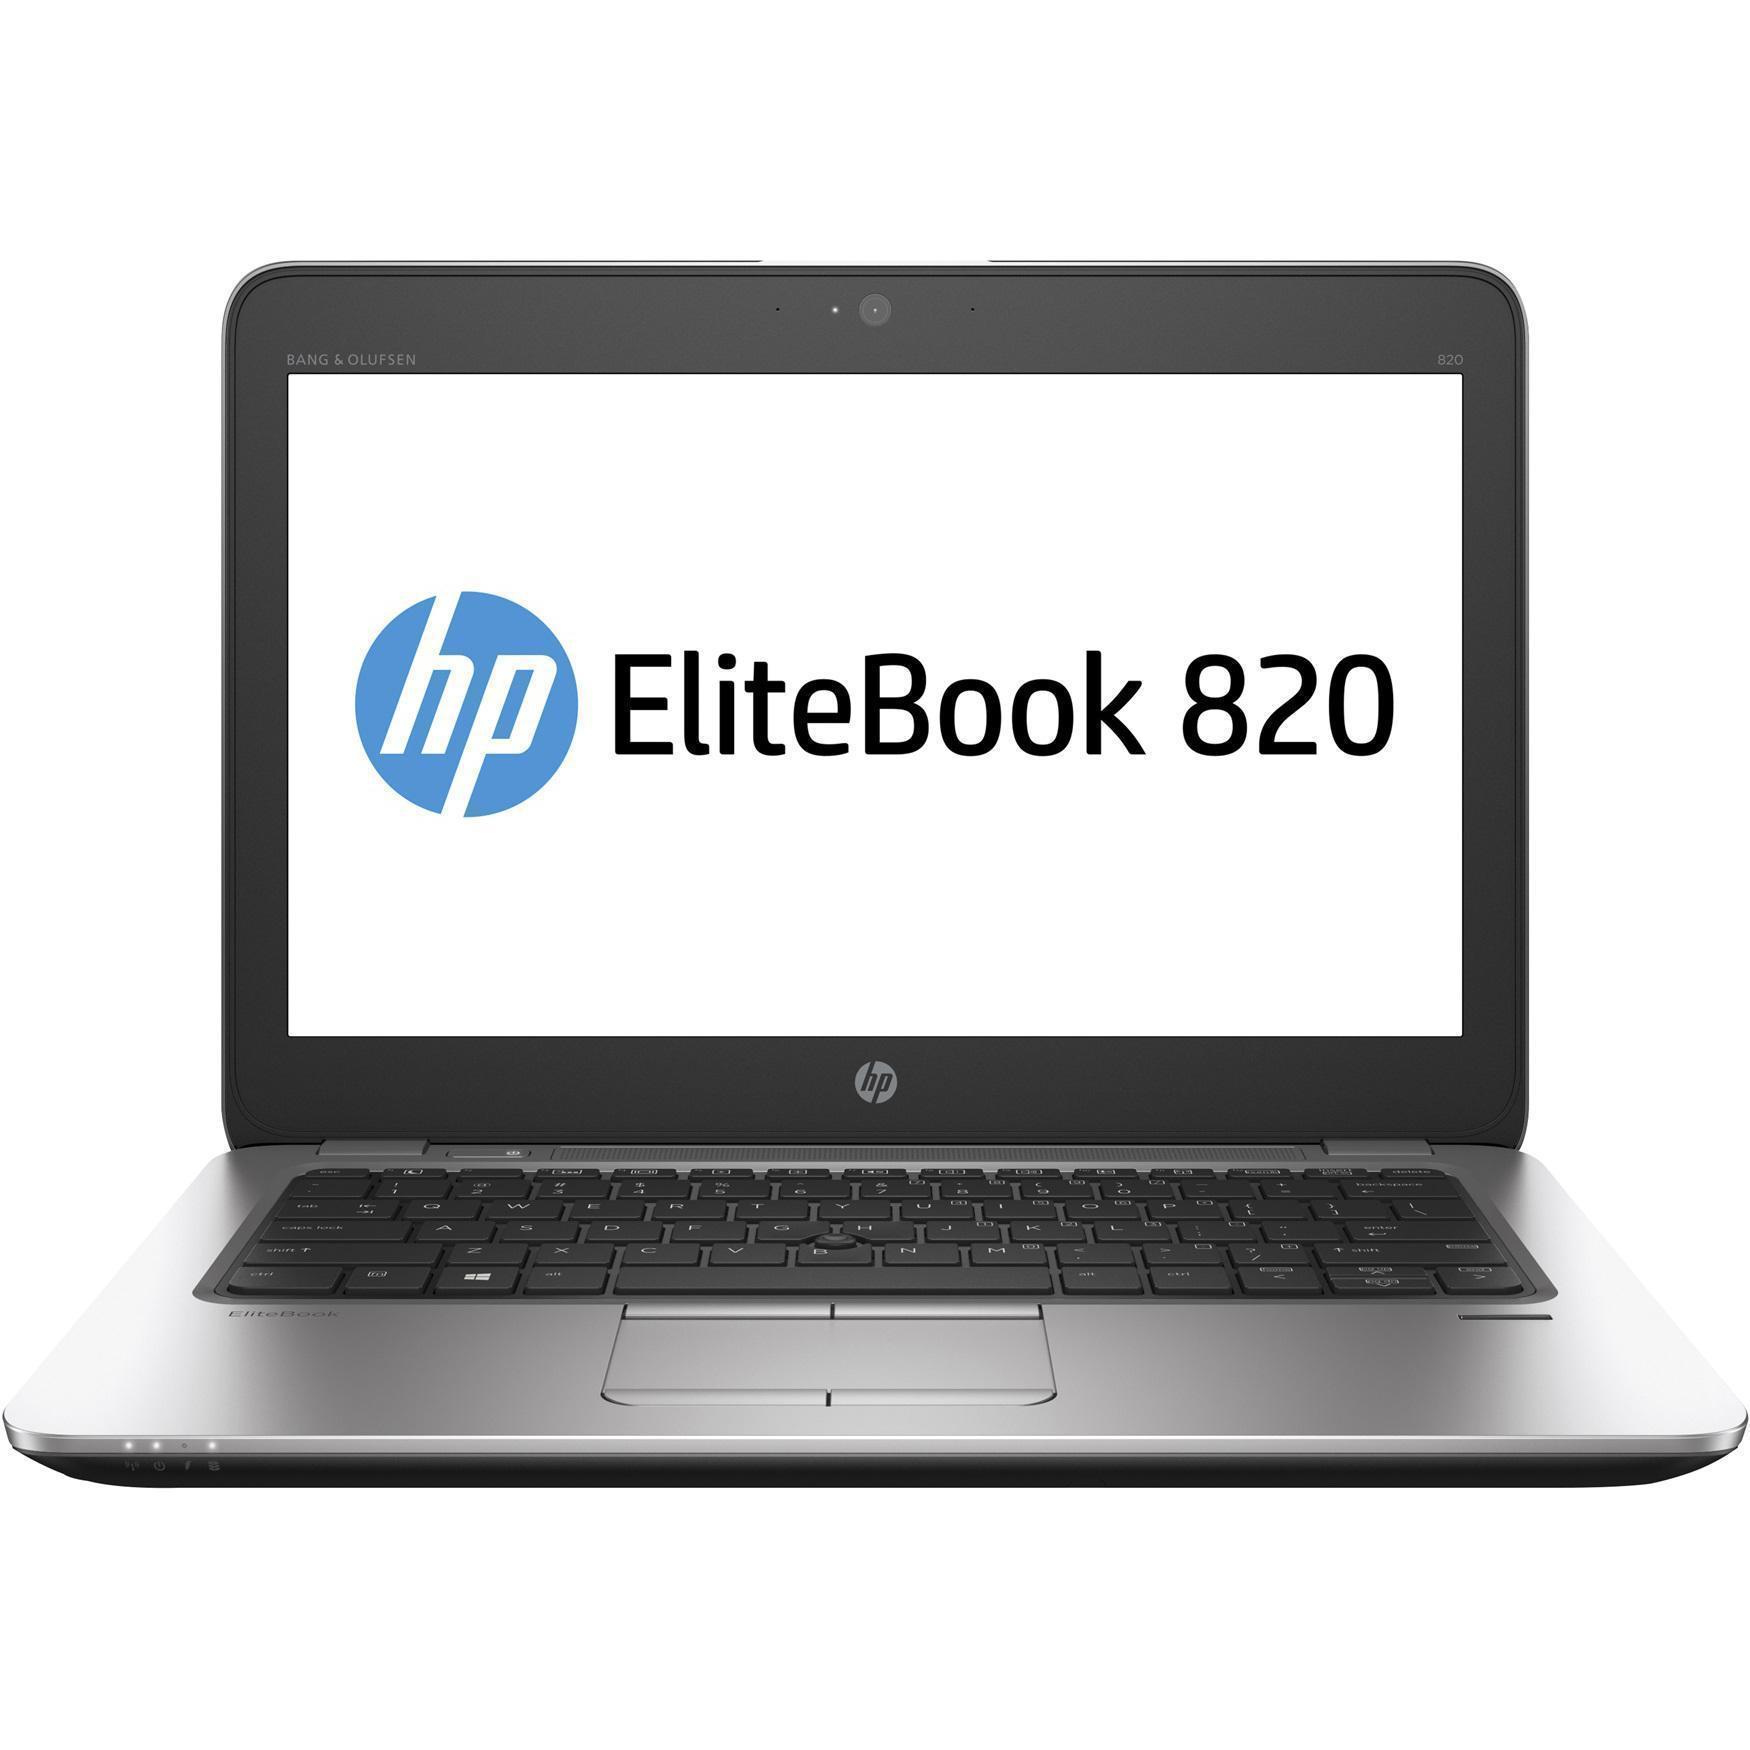 "HP EliteBook 820 G1 12"" Core i5 1,9 GHz - HDD 320 Go - 4 Go QWERTZ - Allemand"